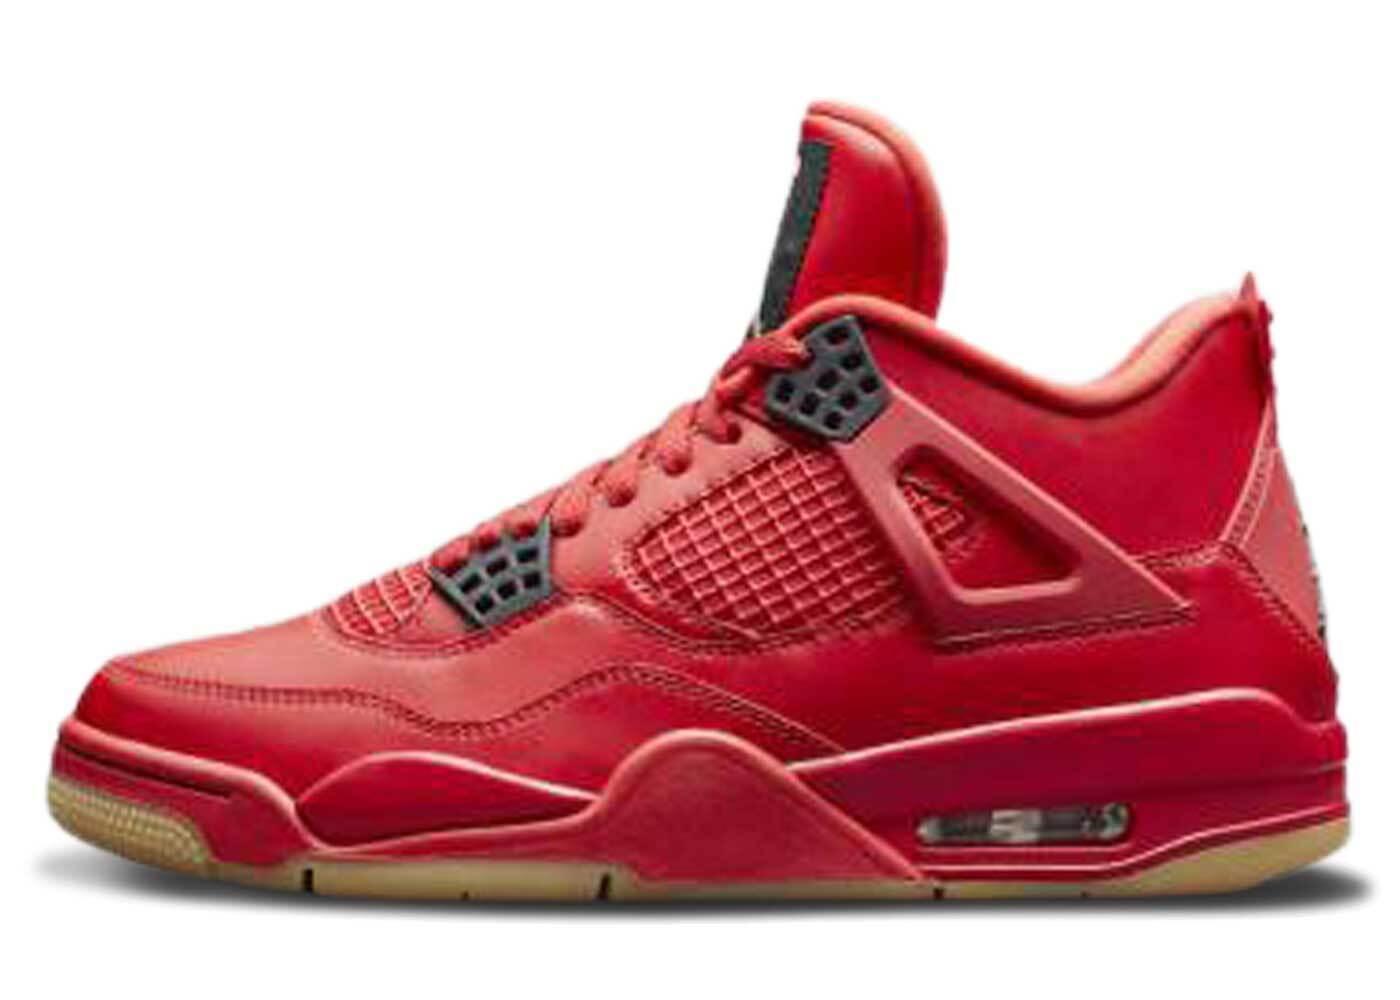 Nike Air Jordan 4 Retro Fire Red Singles Day Womens (2018)の写真